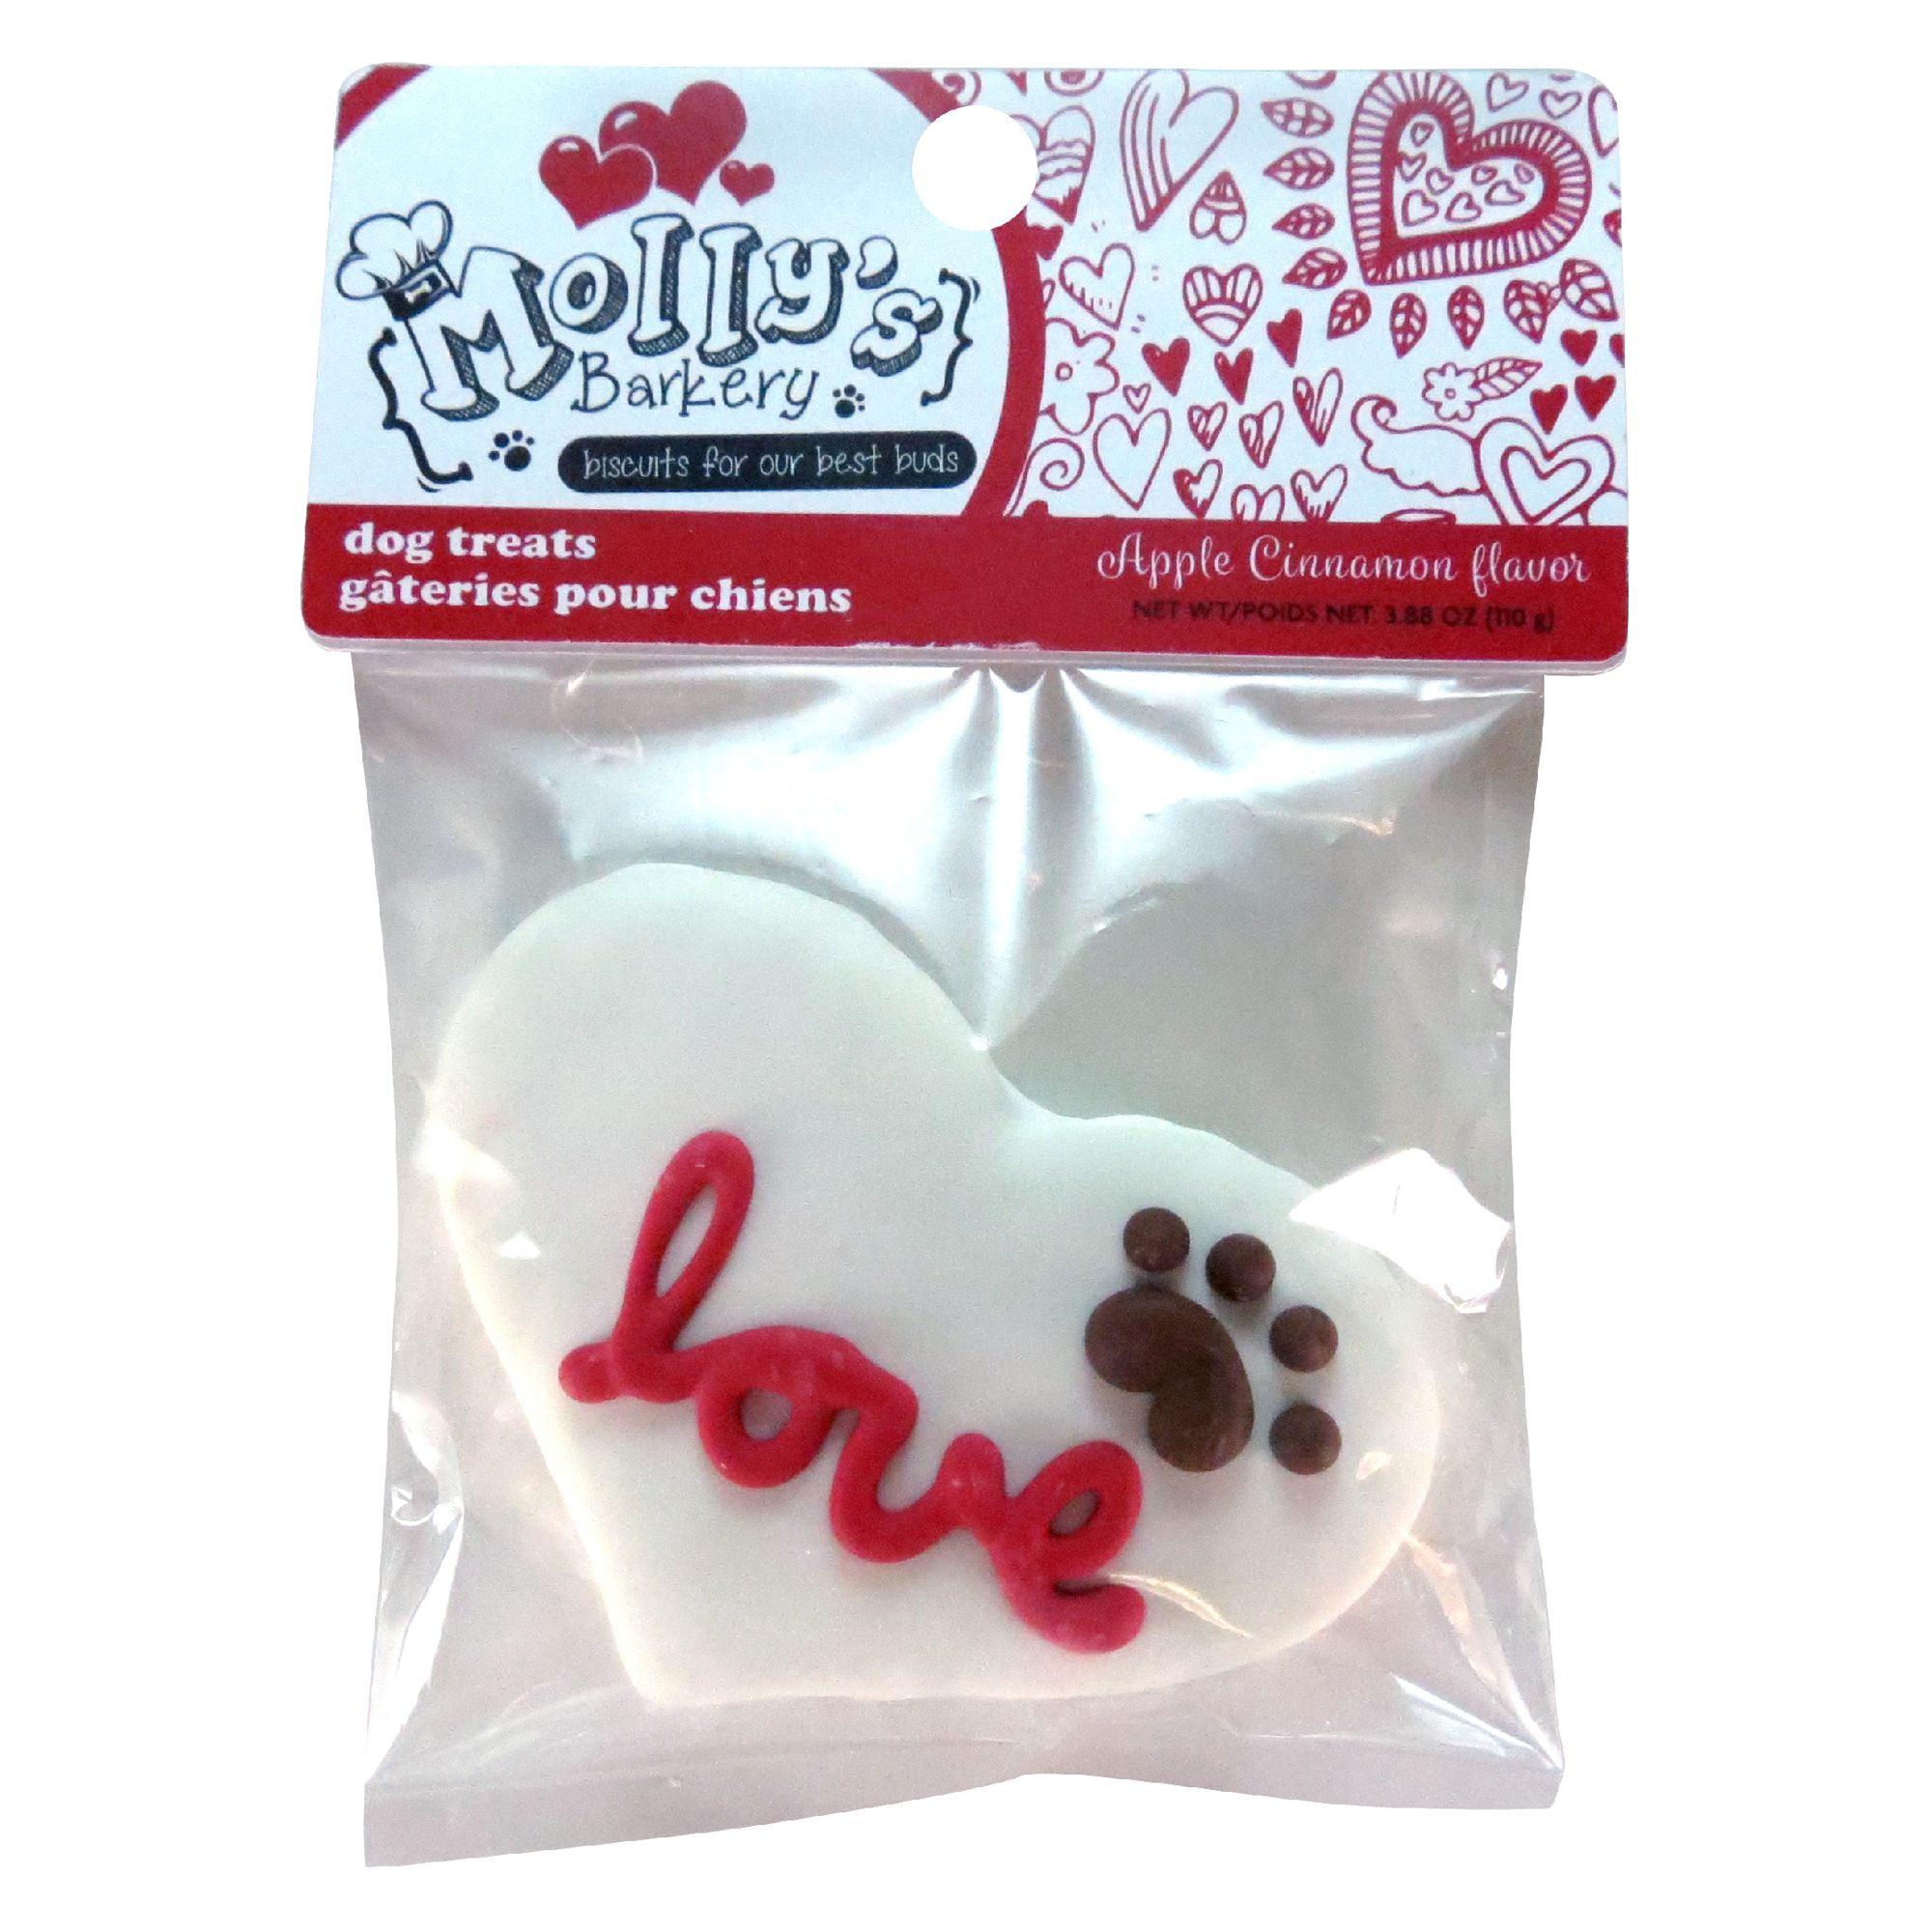 Molly's Barkery Valentine's 'Love' Dog Treat - Apple Cinnamon 5262059